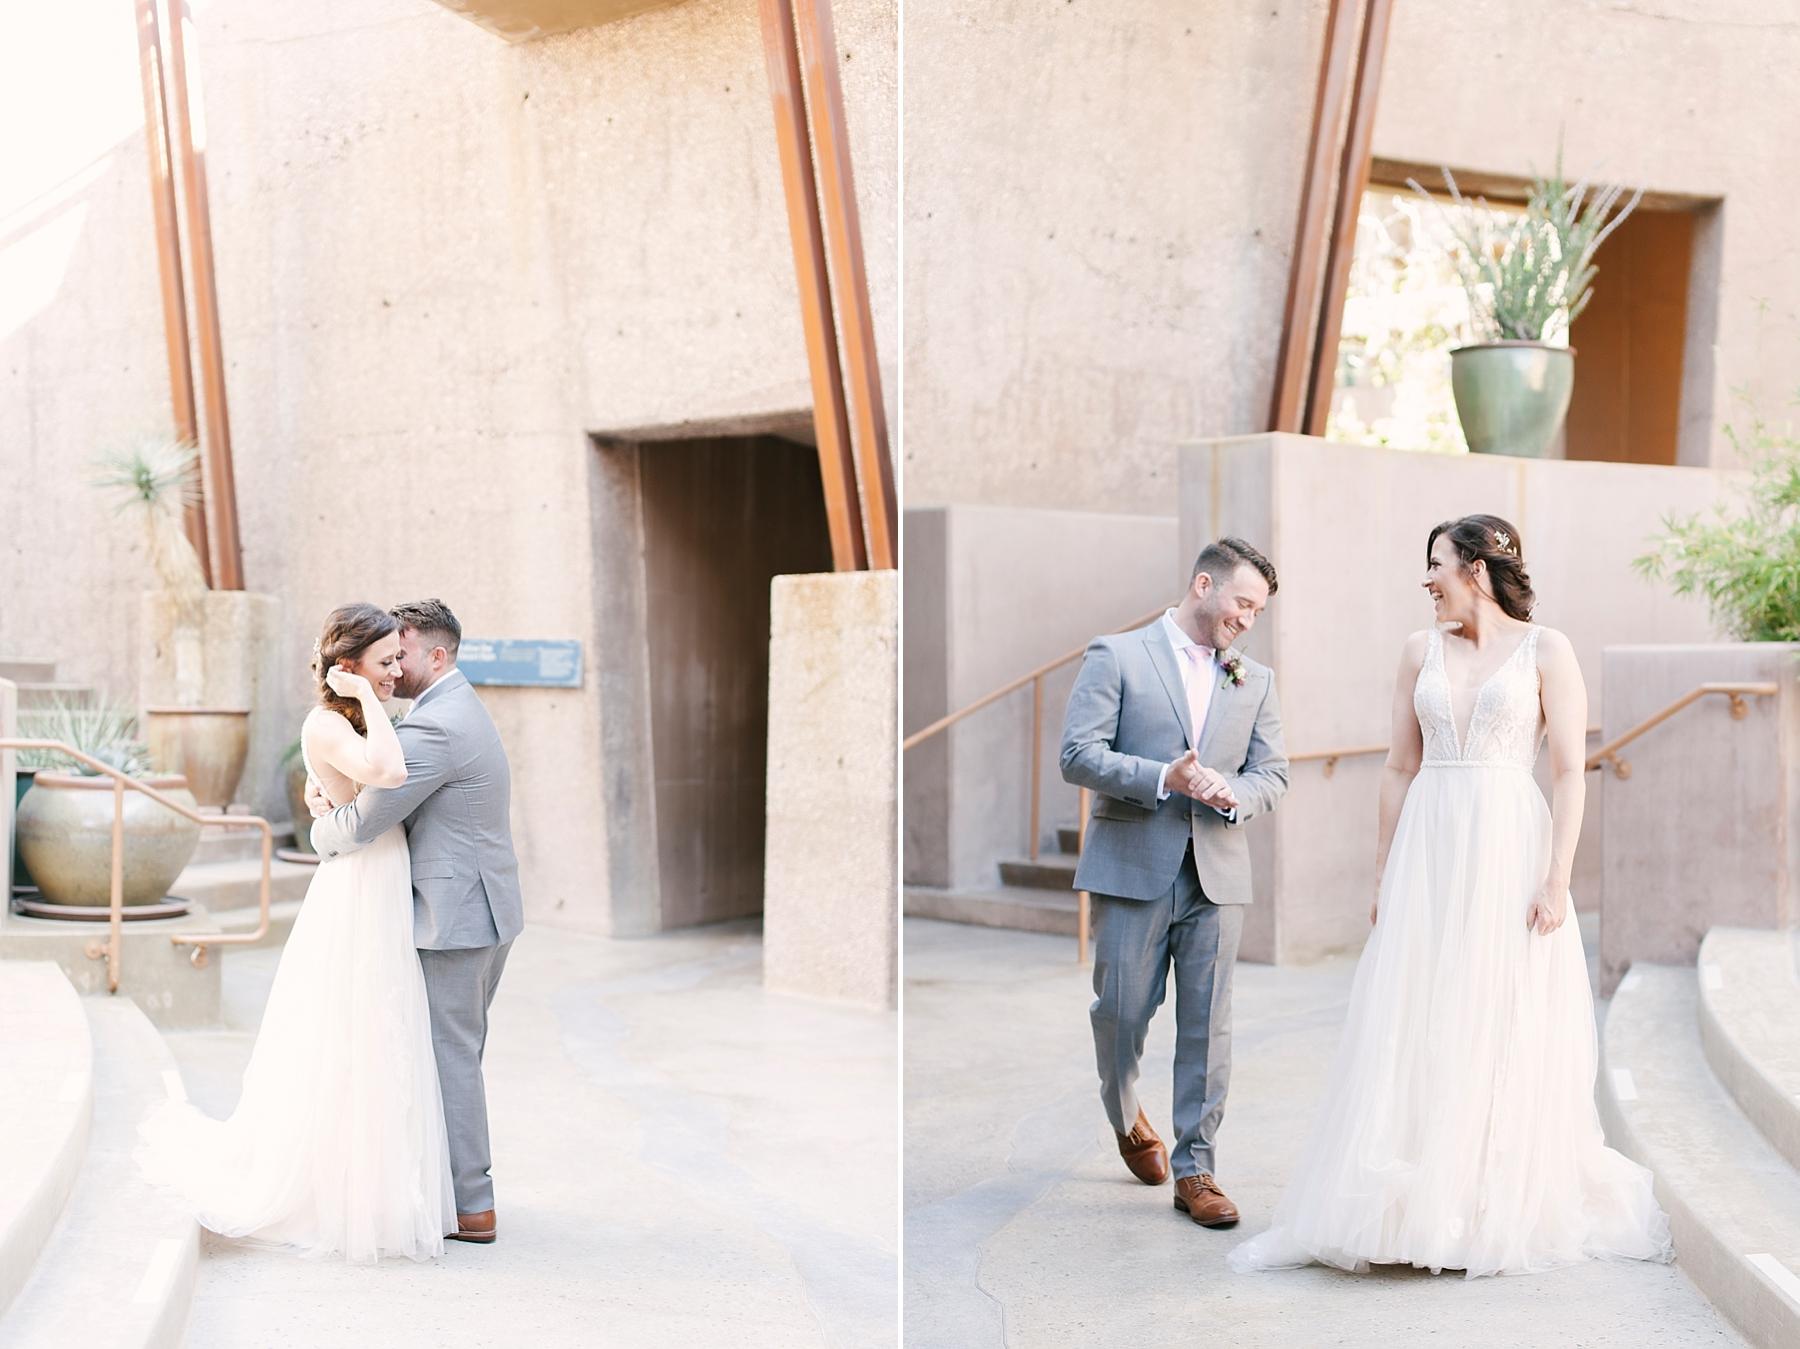 springs-preserve-wedding-las-vegas-destination-photography-the-emerics-15.jpg